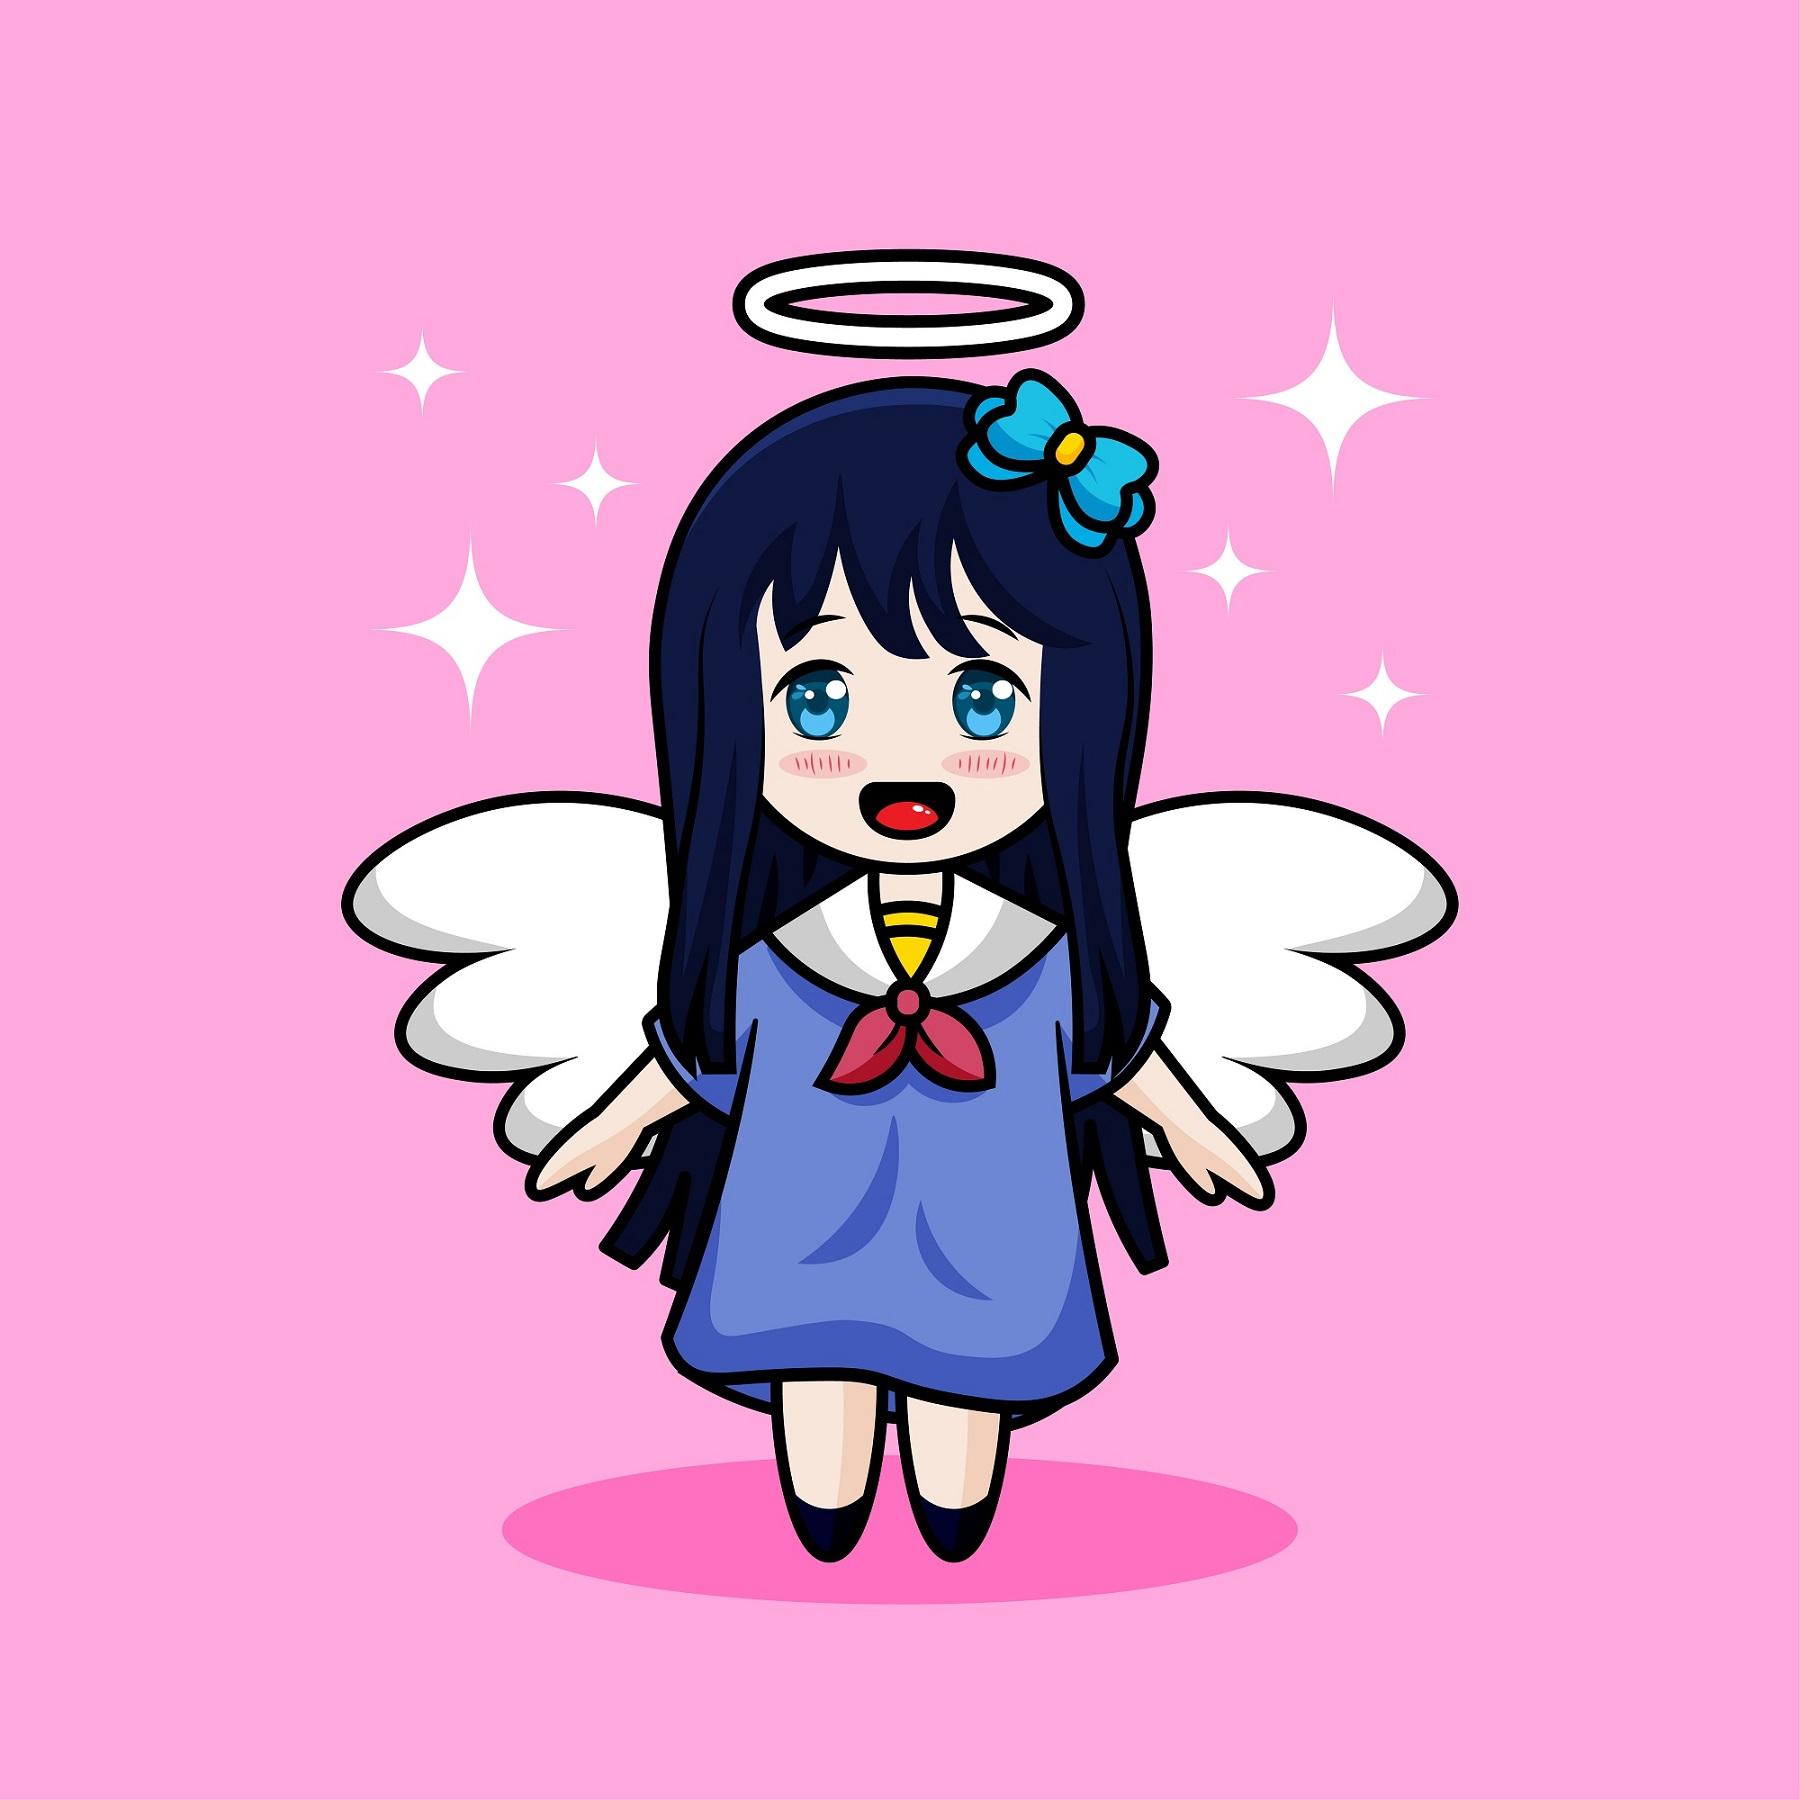 Angel Cartoon Free Vector Art 559 Free Downloads